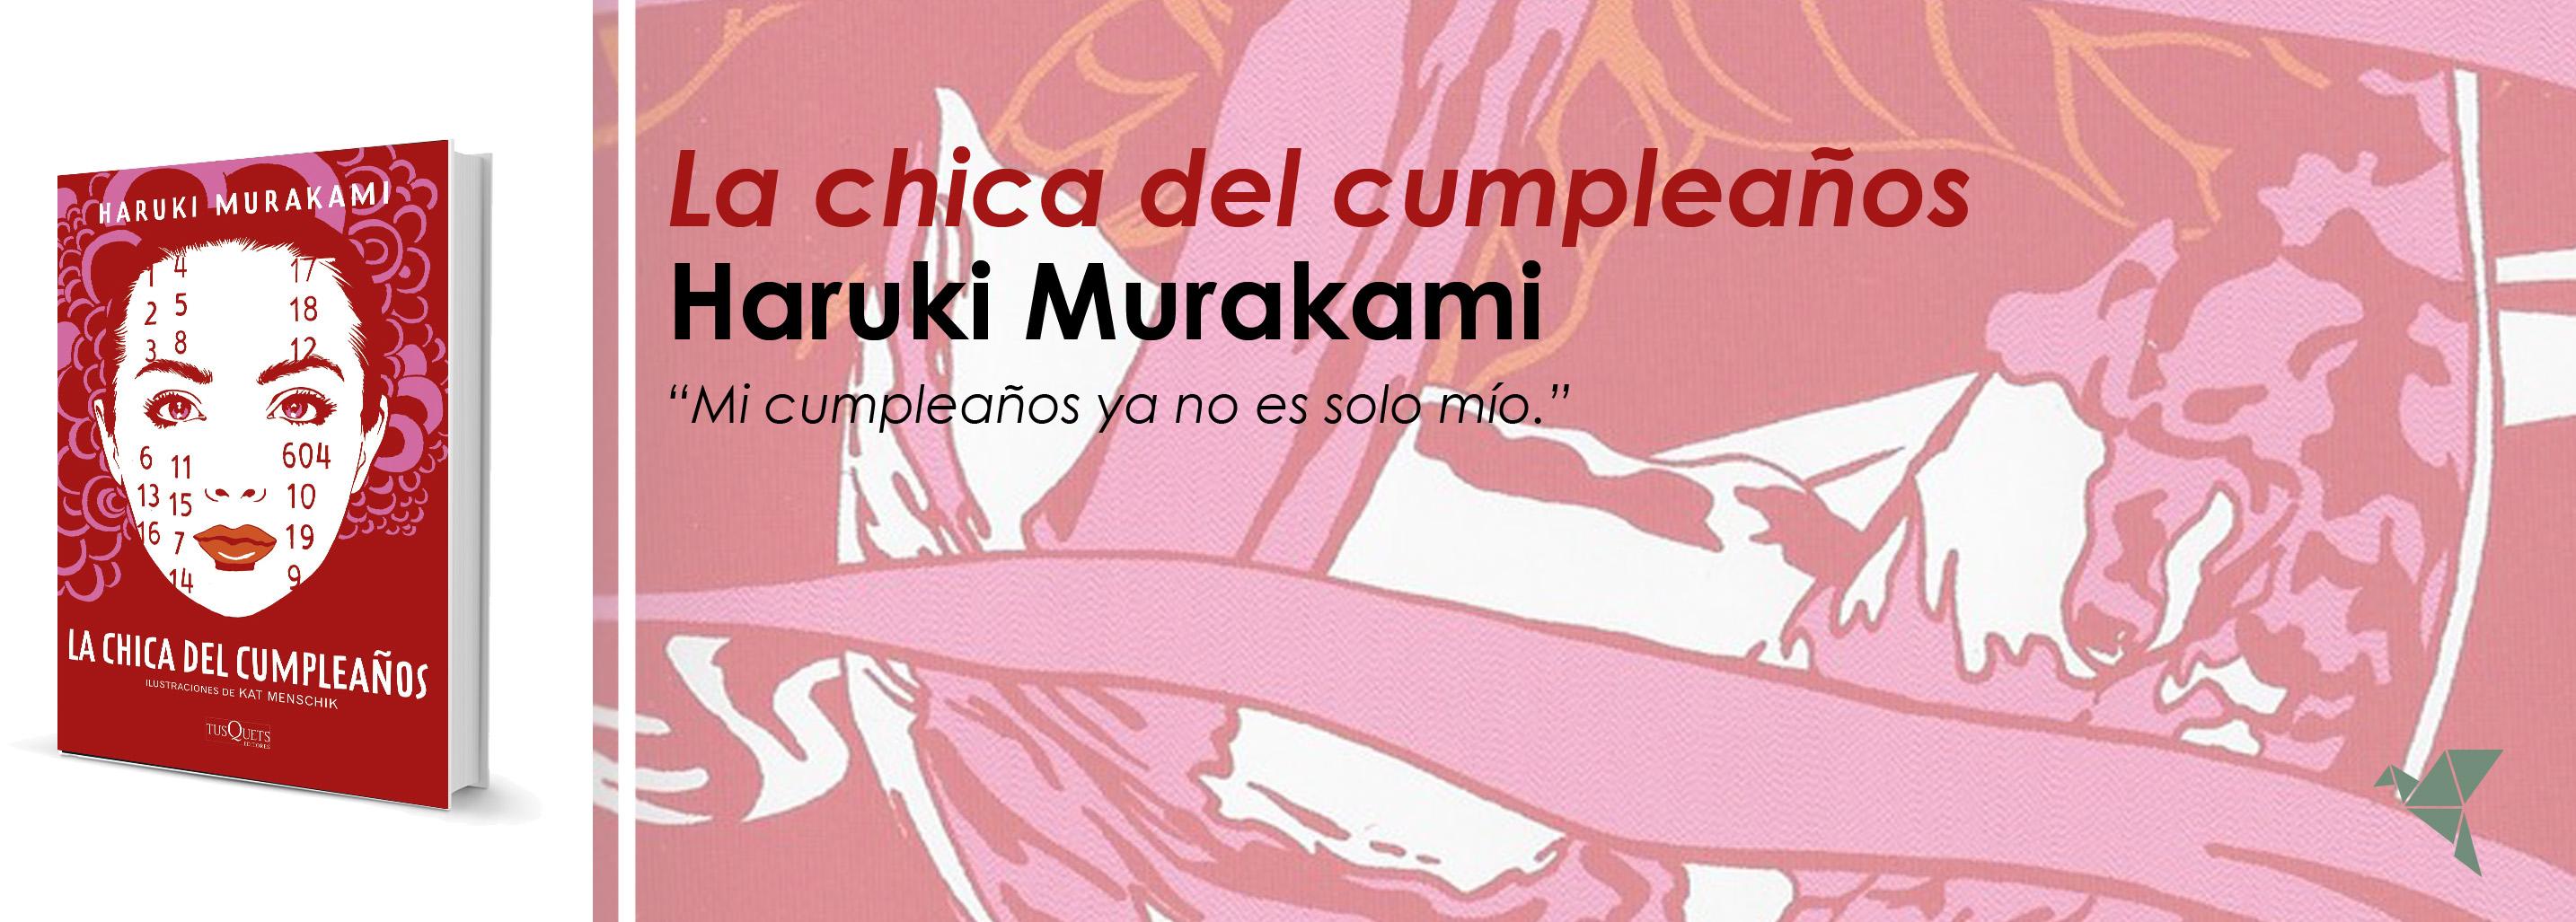 La chica del cumpleaños, de Haruki Murakami